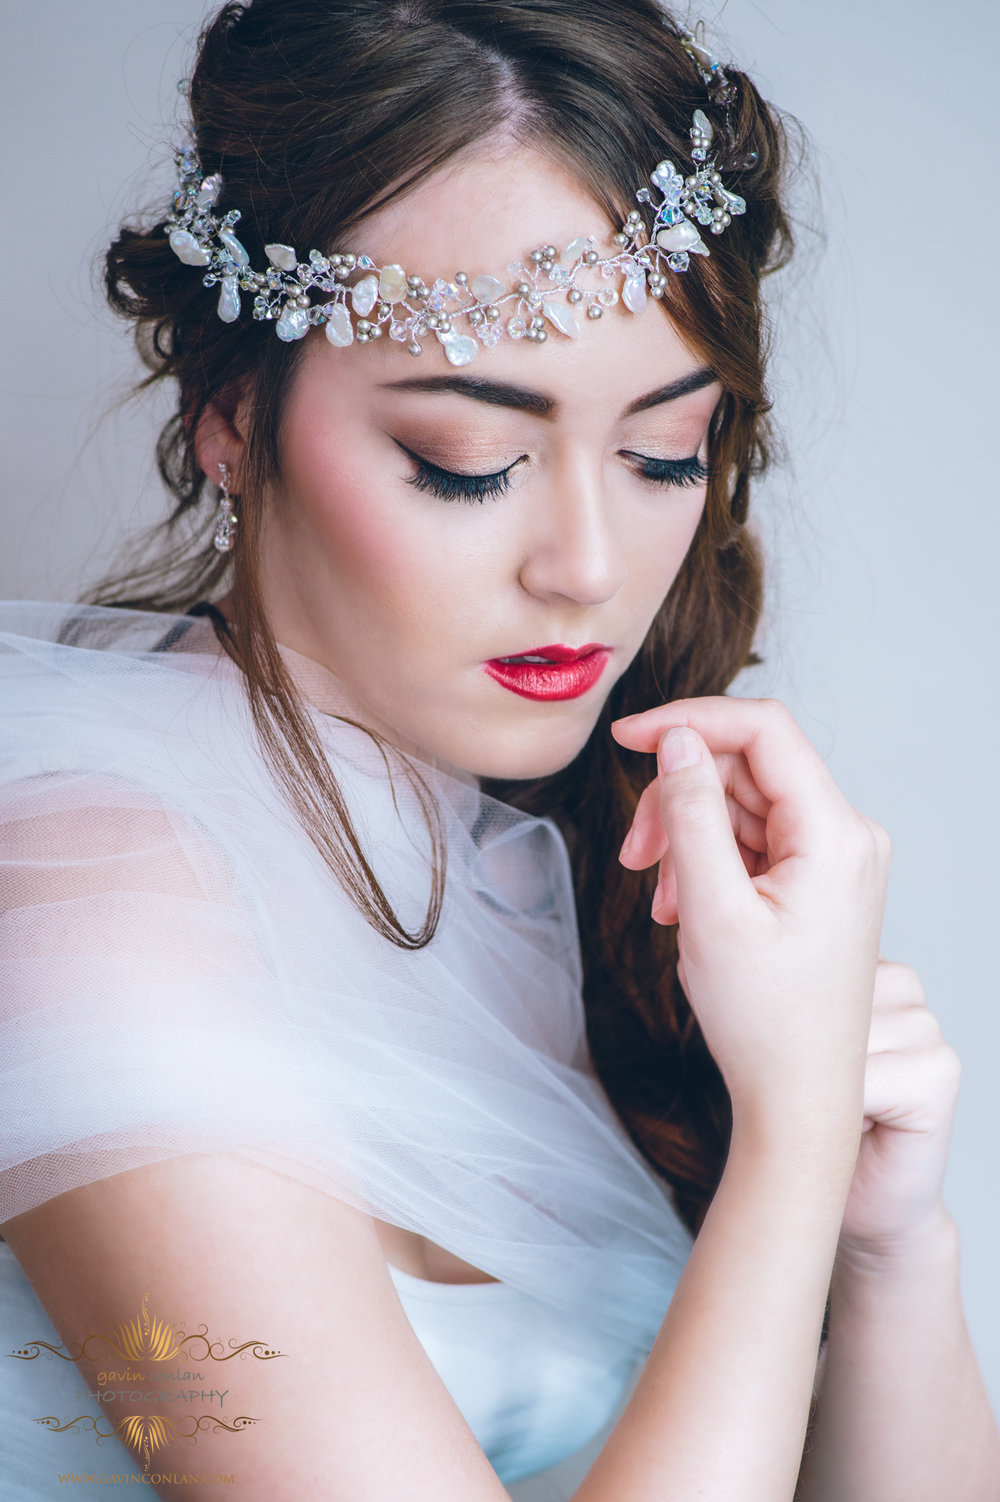 creative-bridal-hair-make-up-jewellery-photo-shoot-gavinconlanphotography-16